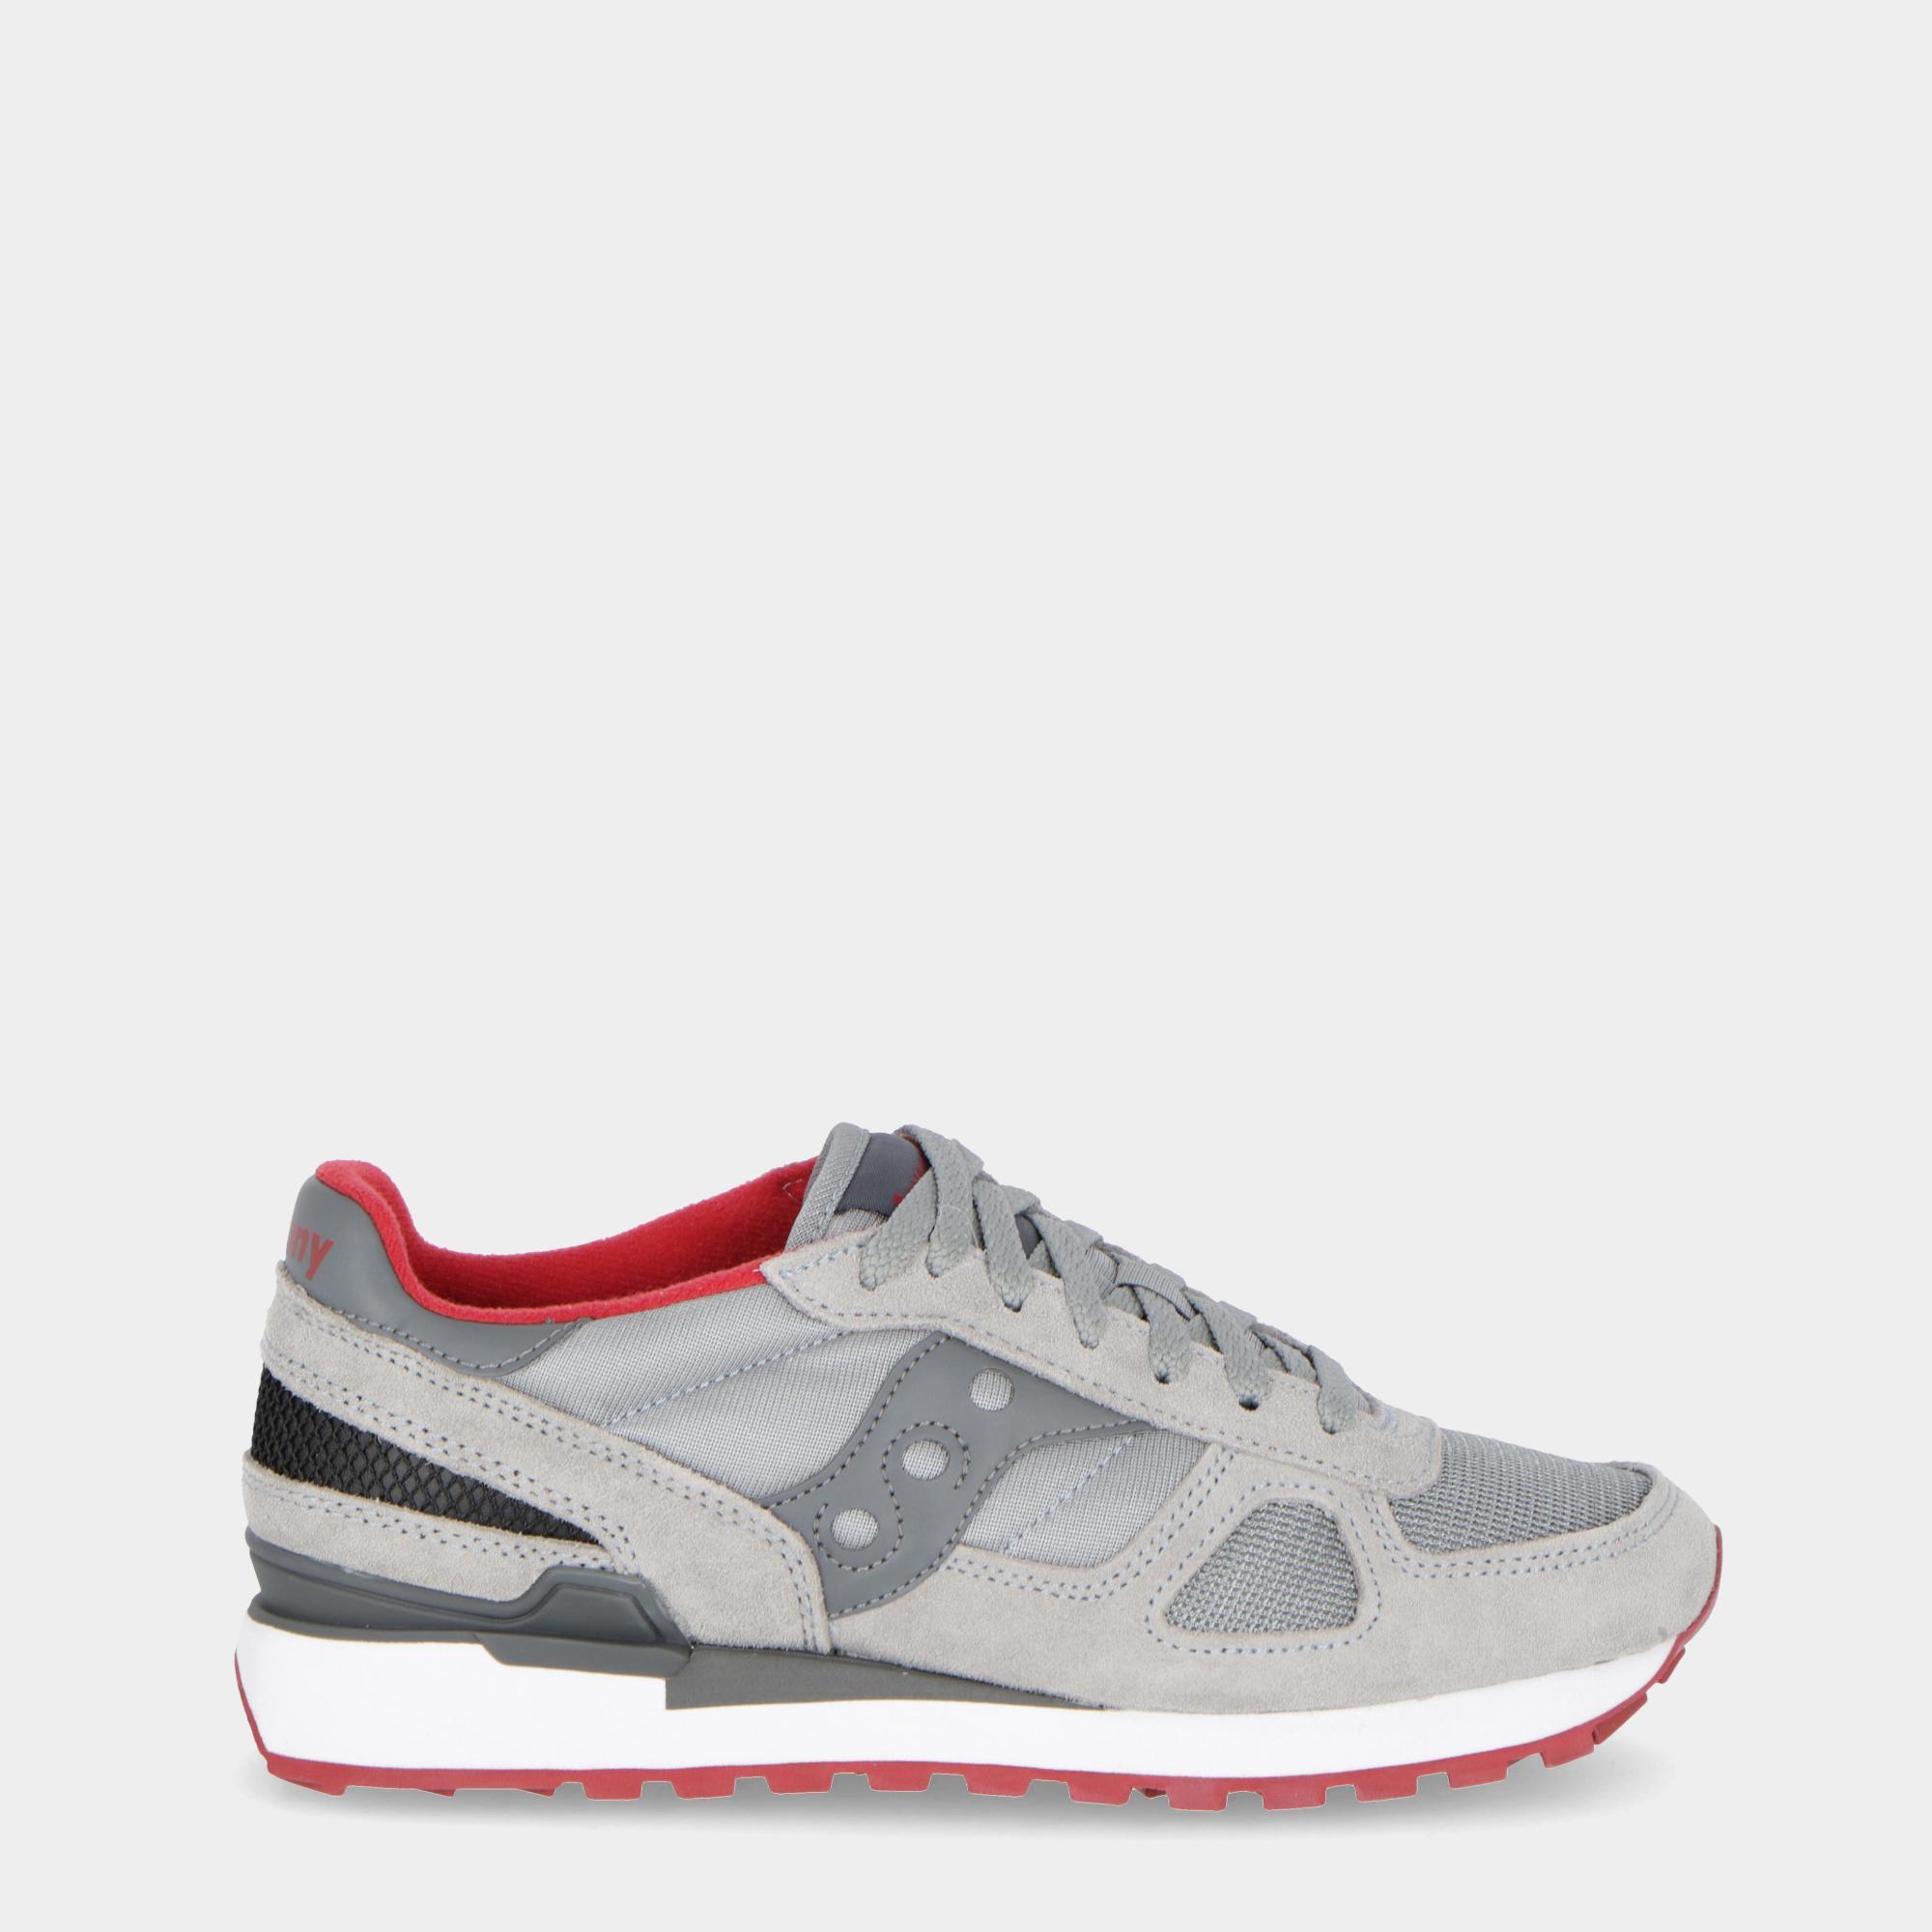 43979d2d529f Saucony Shadow Original Grey Red White